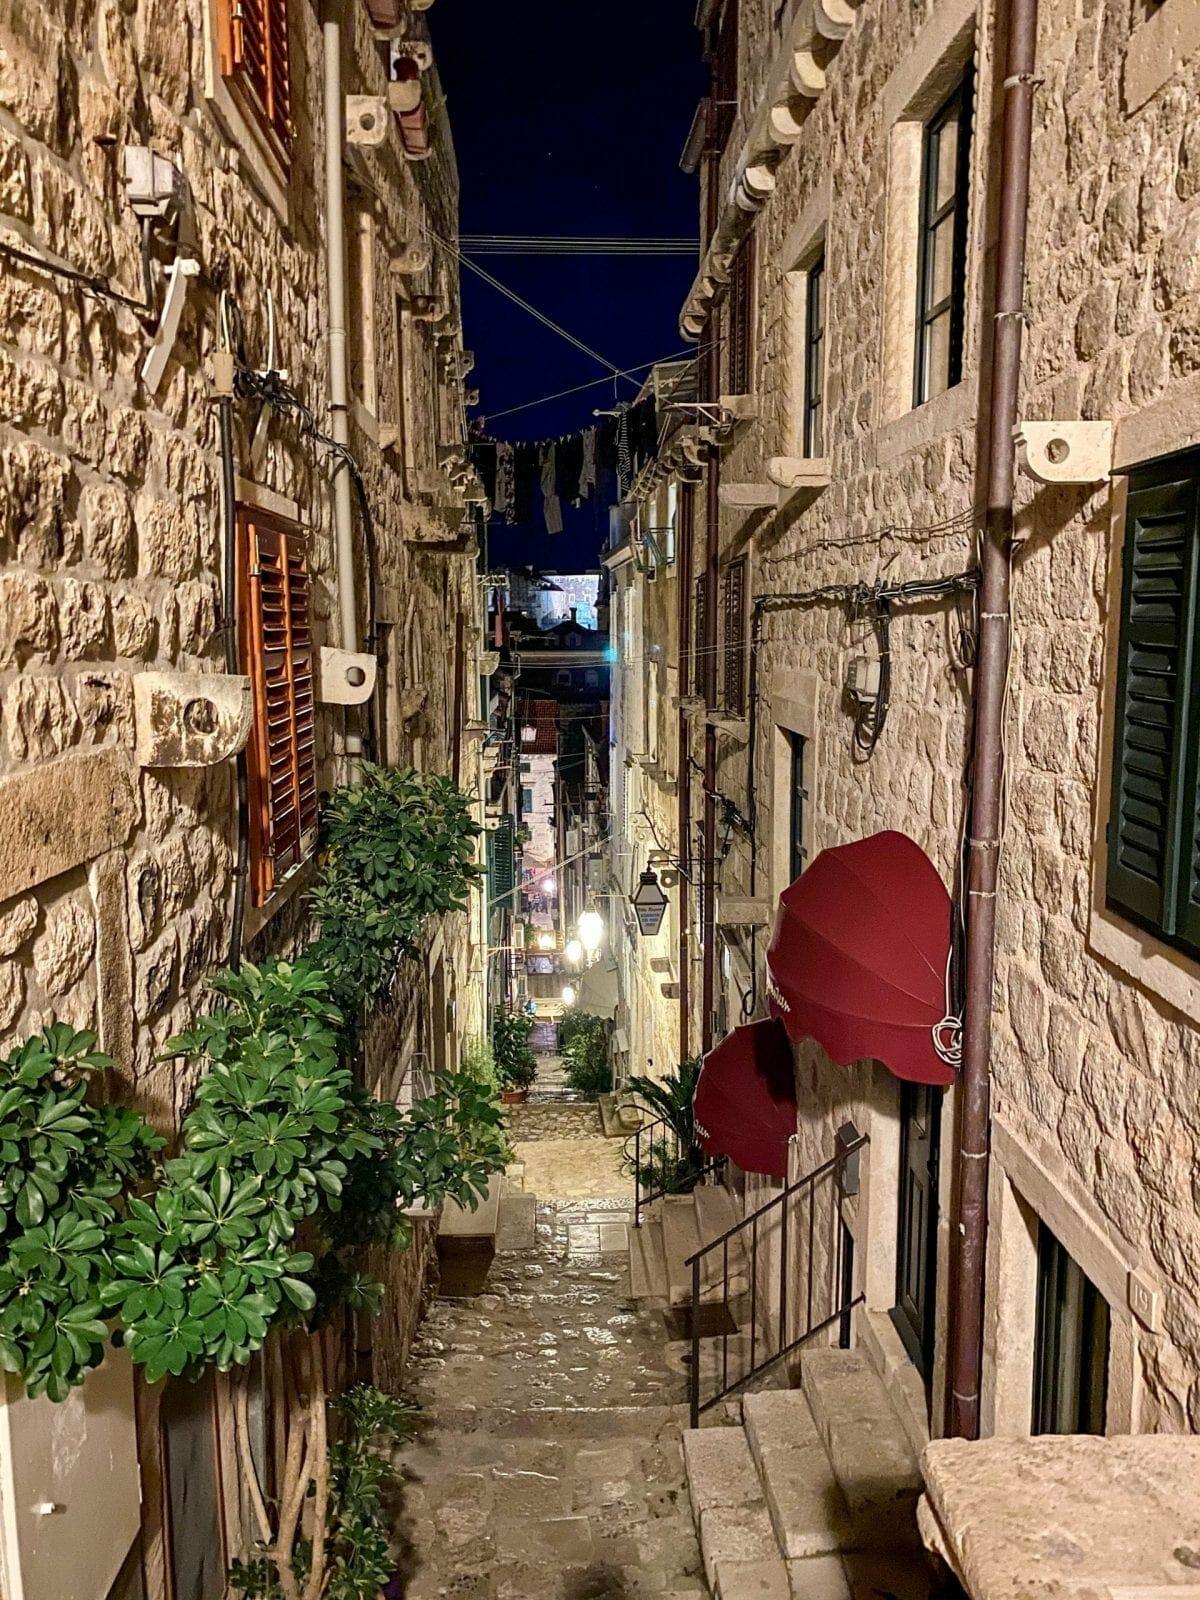 Dubrovnik city streets at night